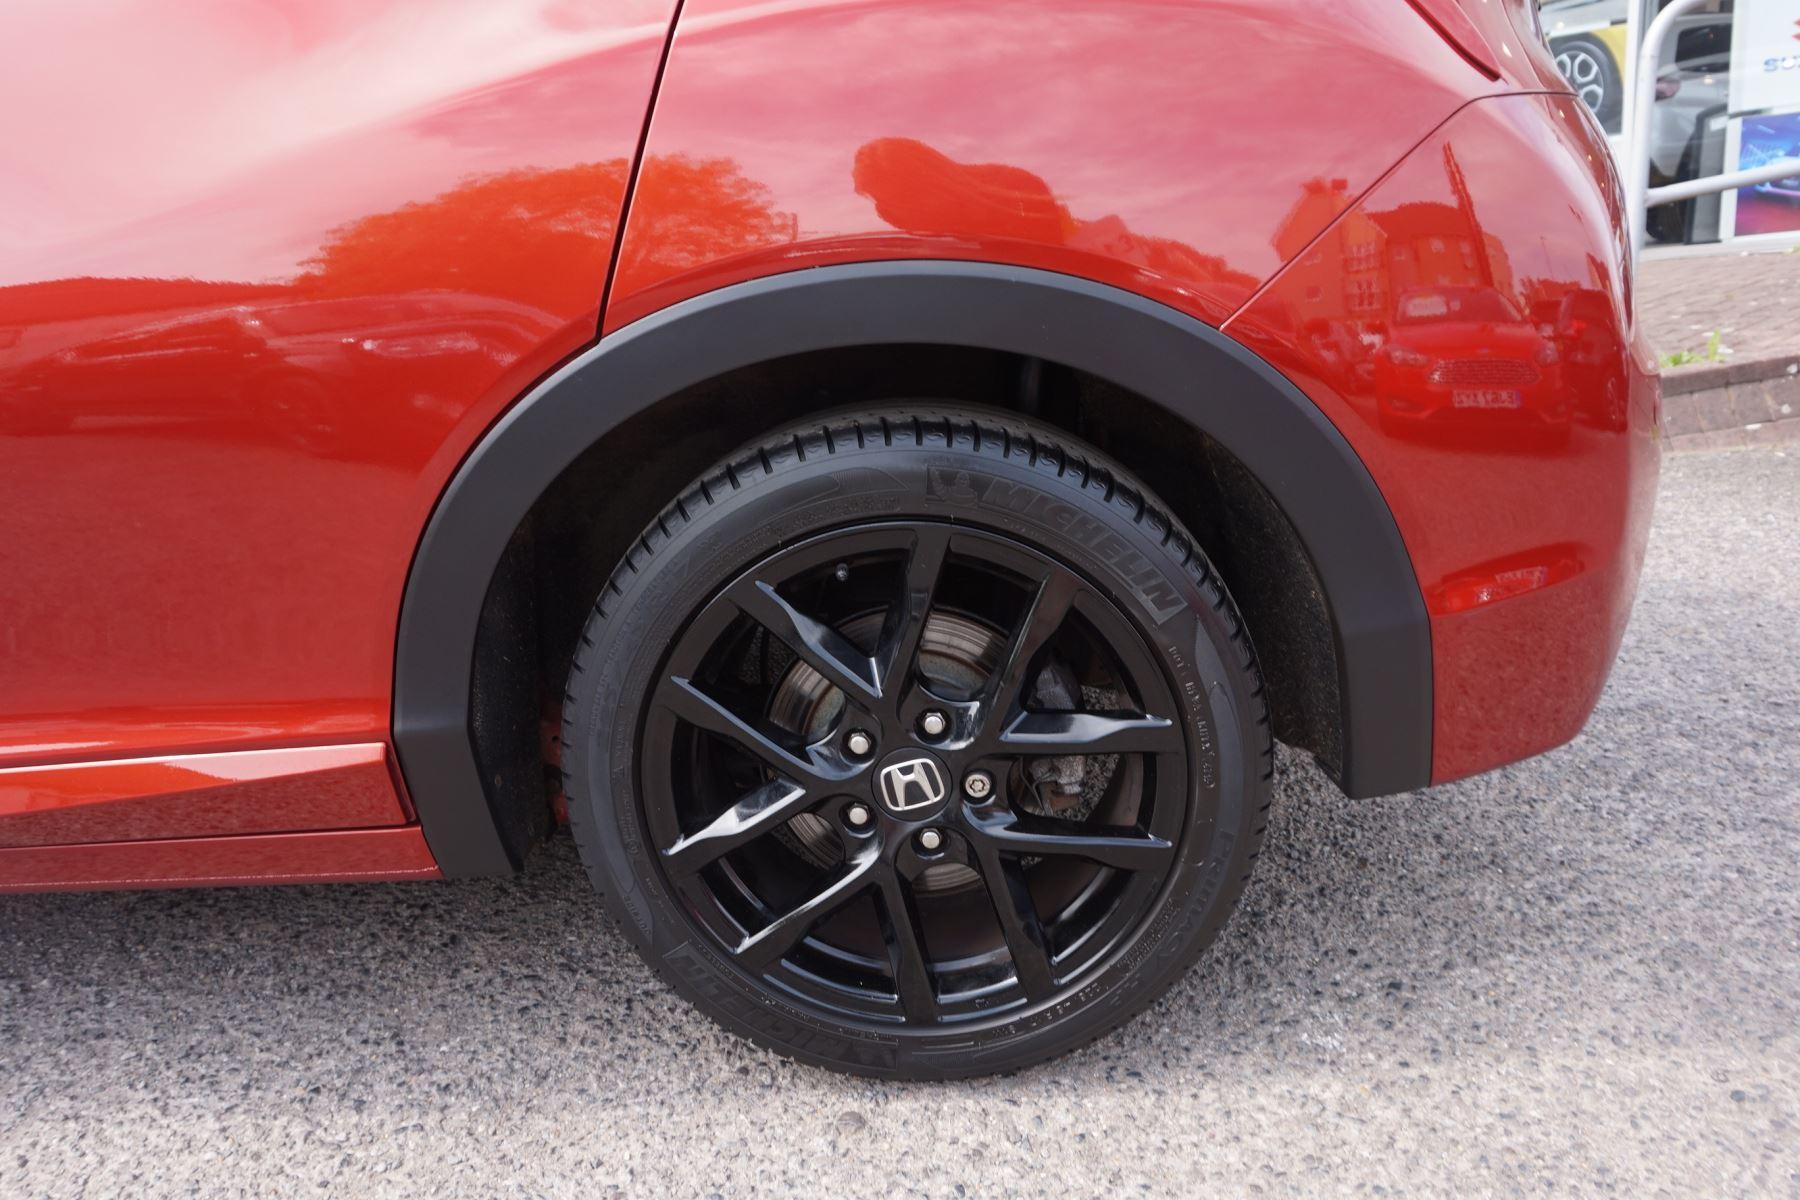 Honda Civic 1.6 i-DTEC Sport [Nav] image 8